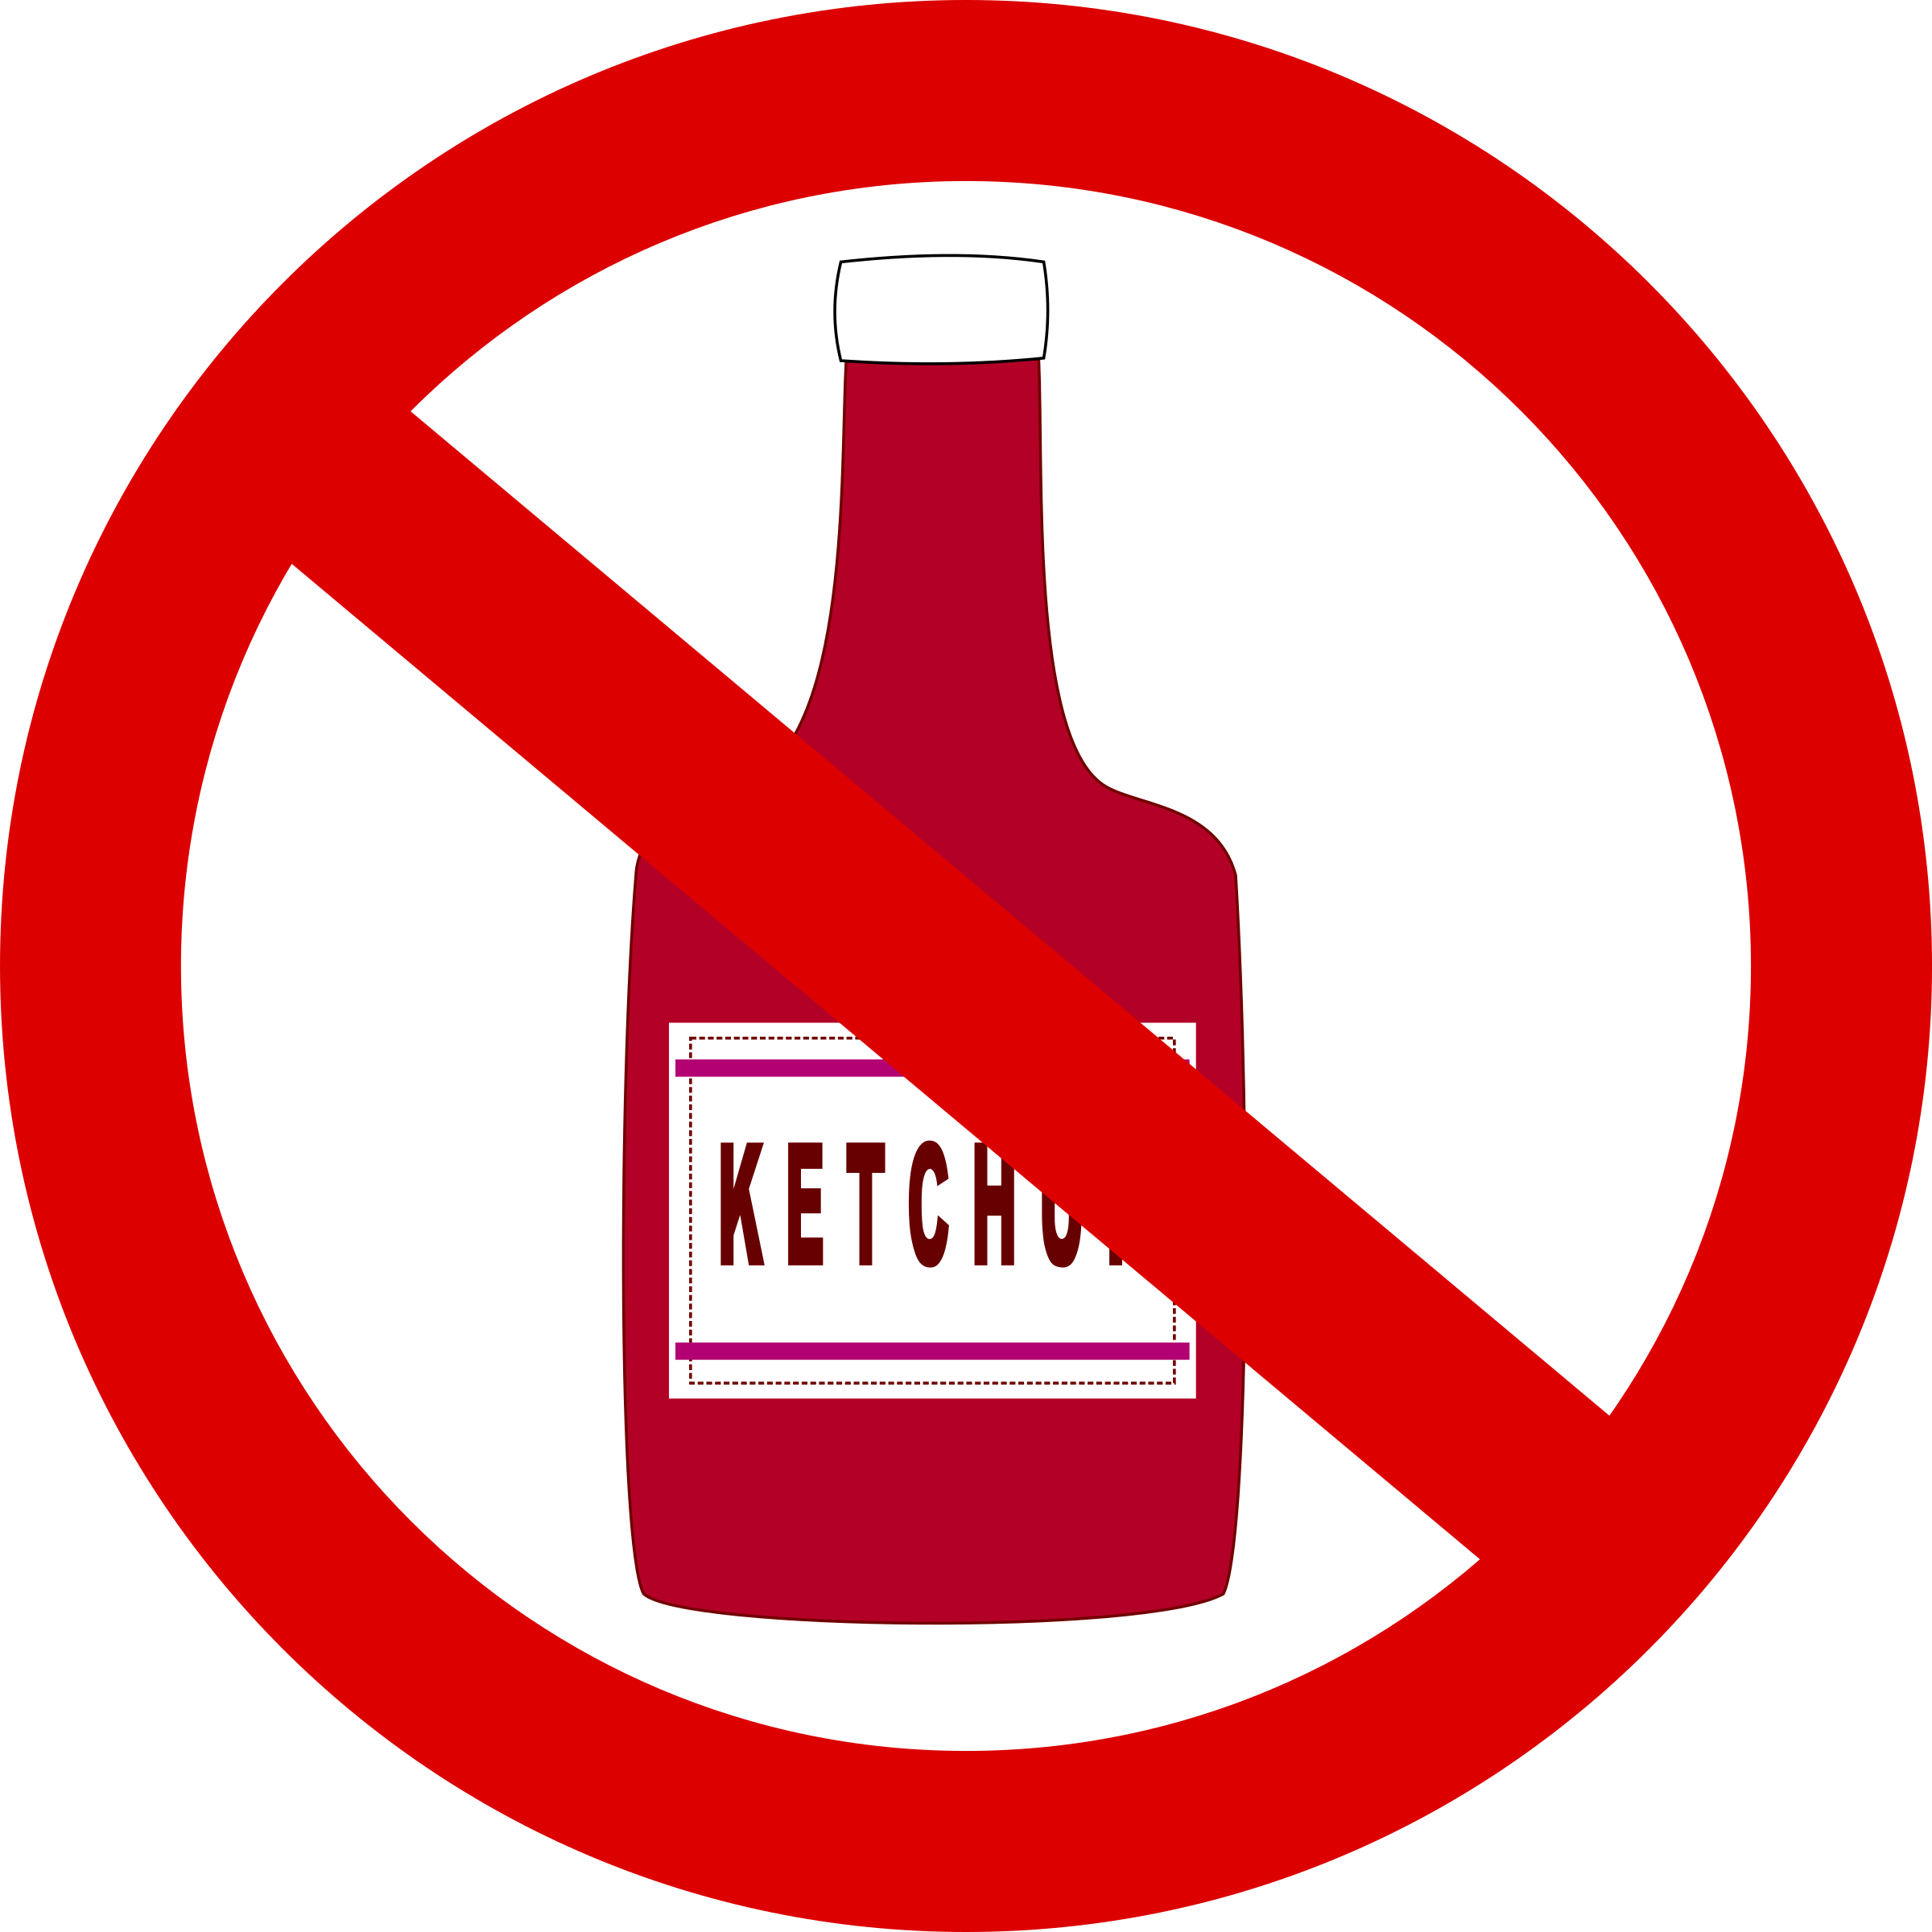 Forbidden big image png. Ketchup clipart small